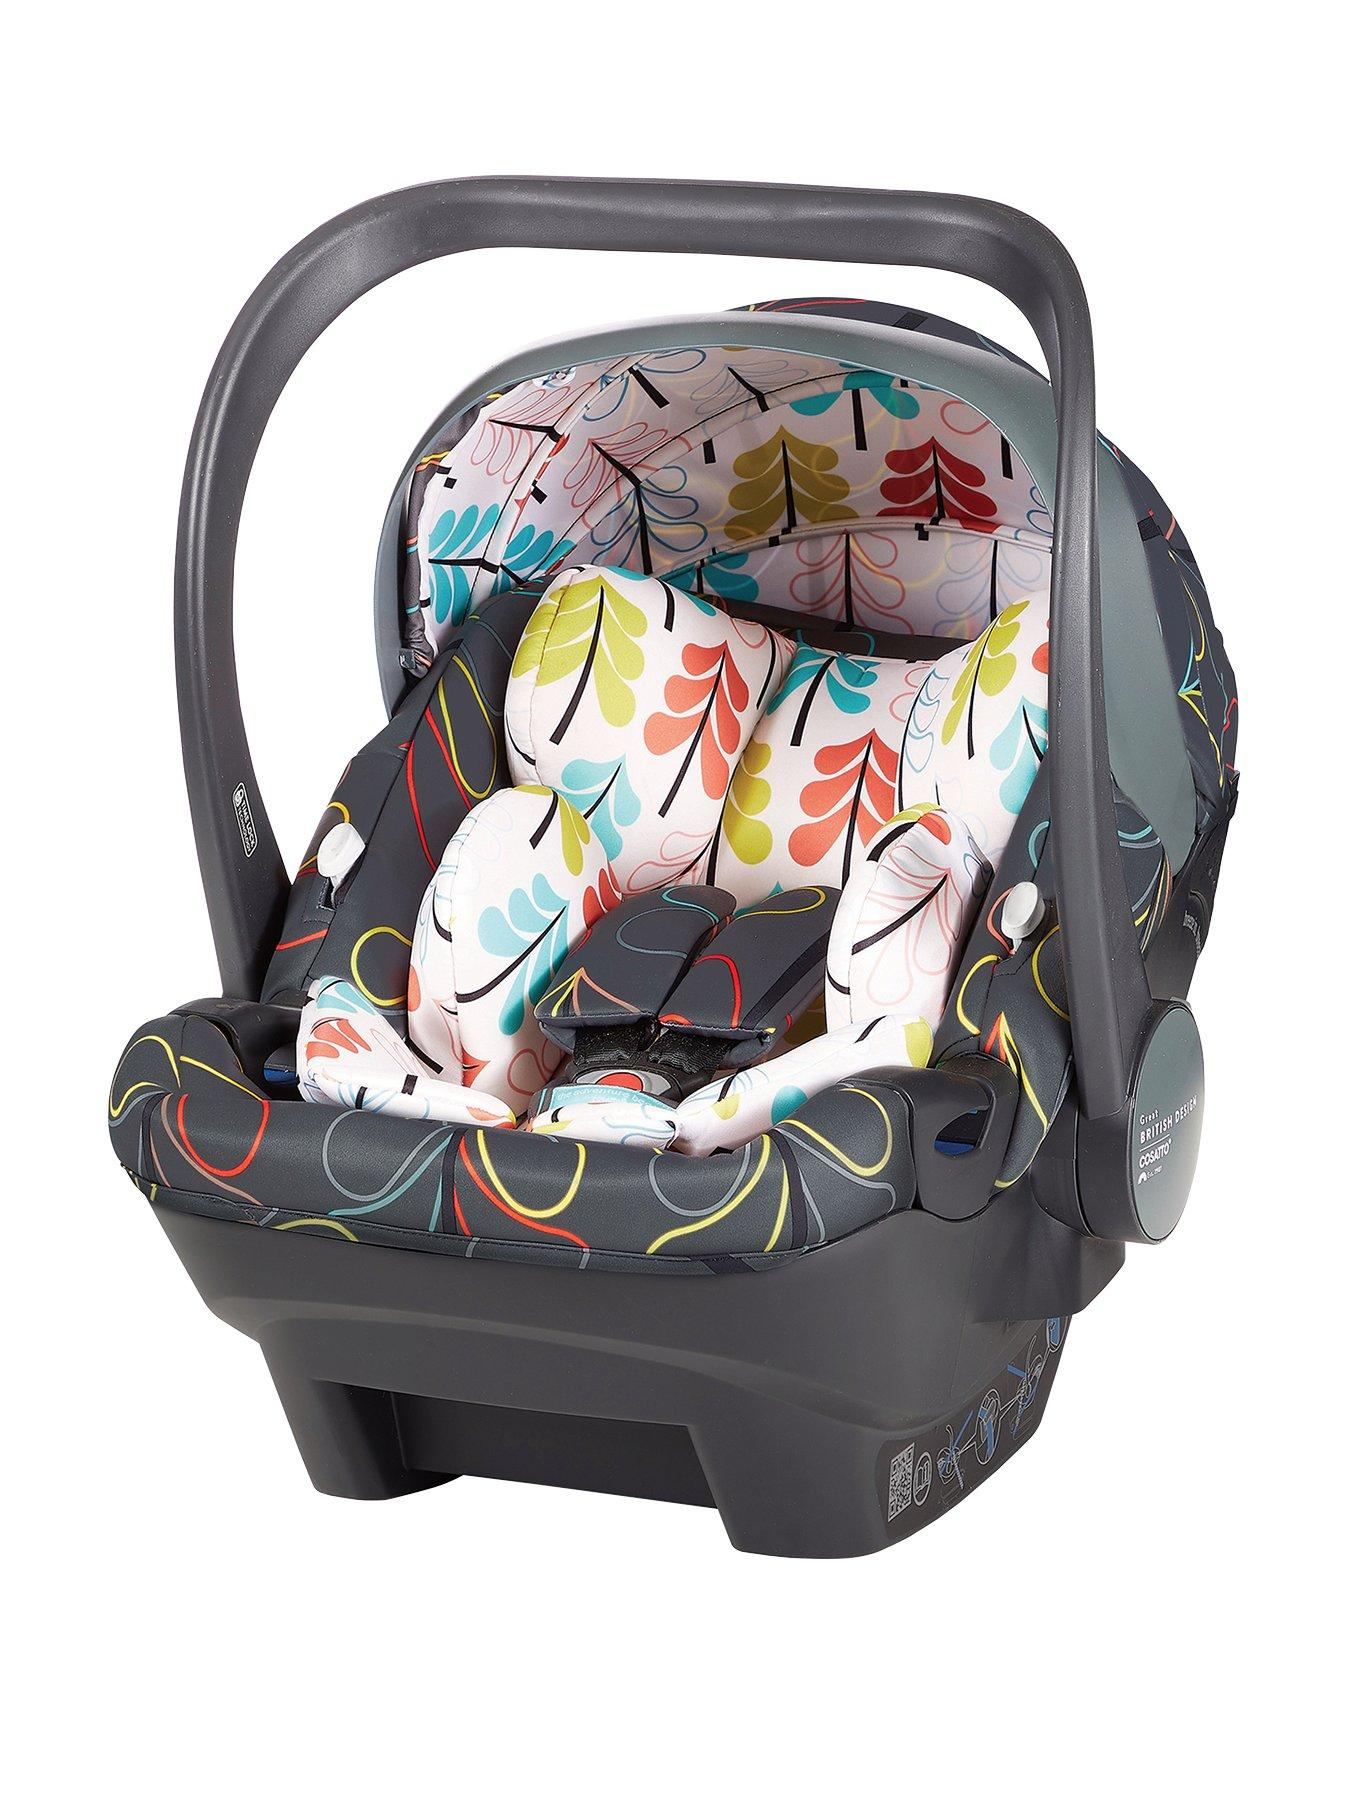 Sweet Baby Soft Design Seat Reducer Newborn Insert Head Cushion for Baby Car Seat Size 0//0 apple